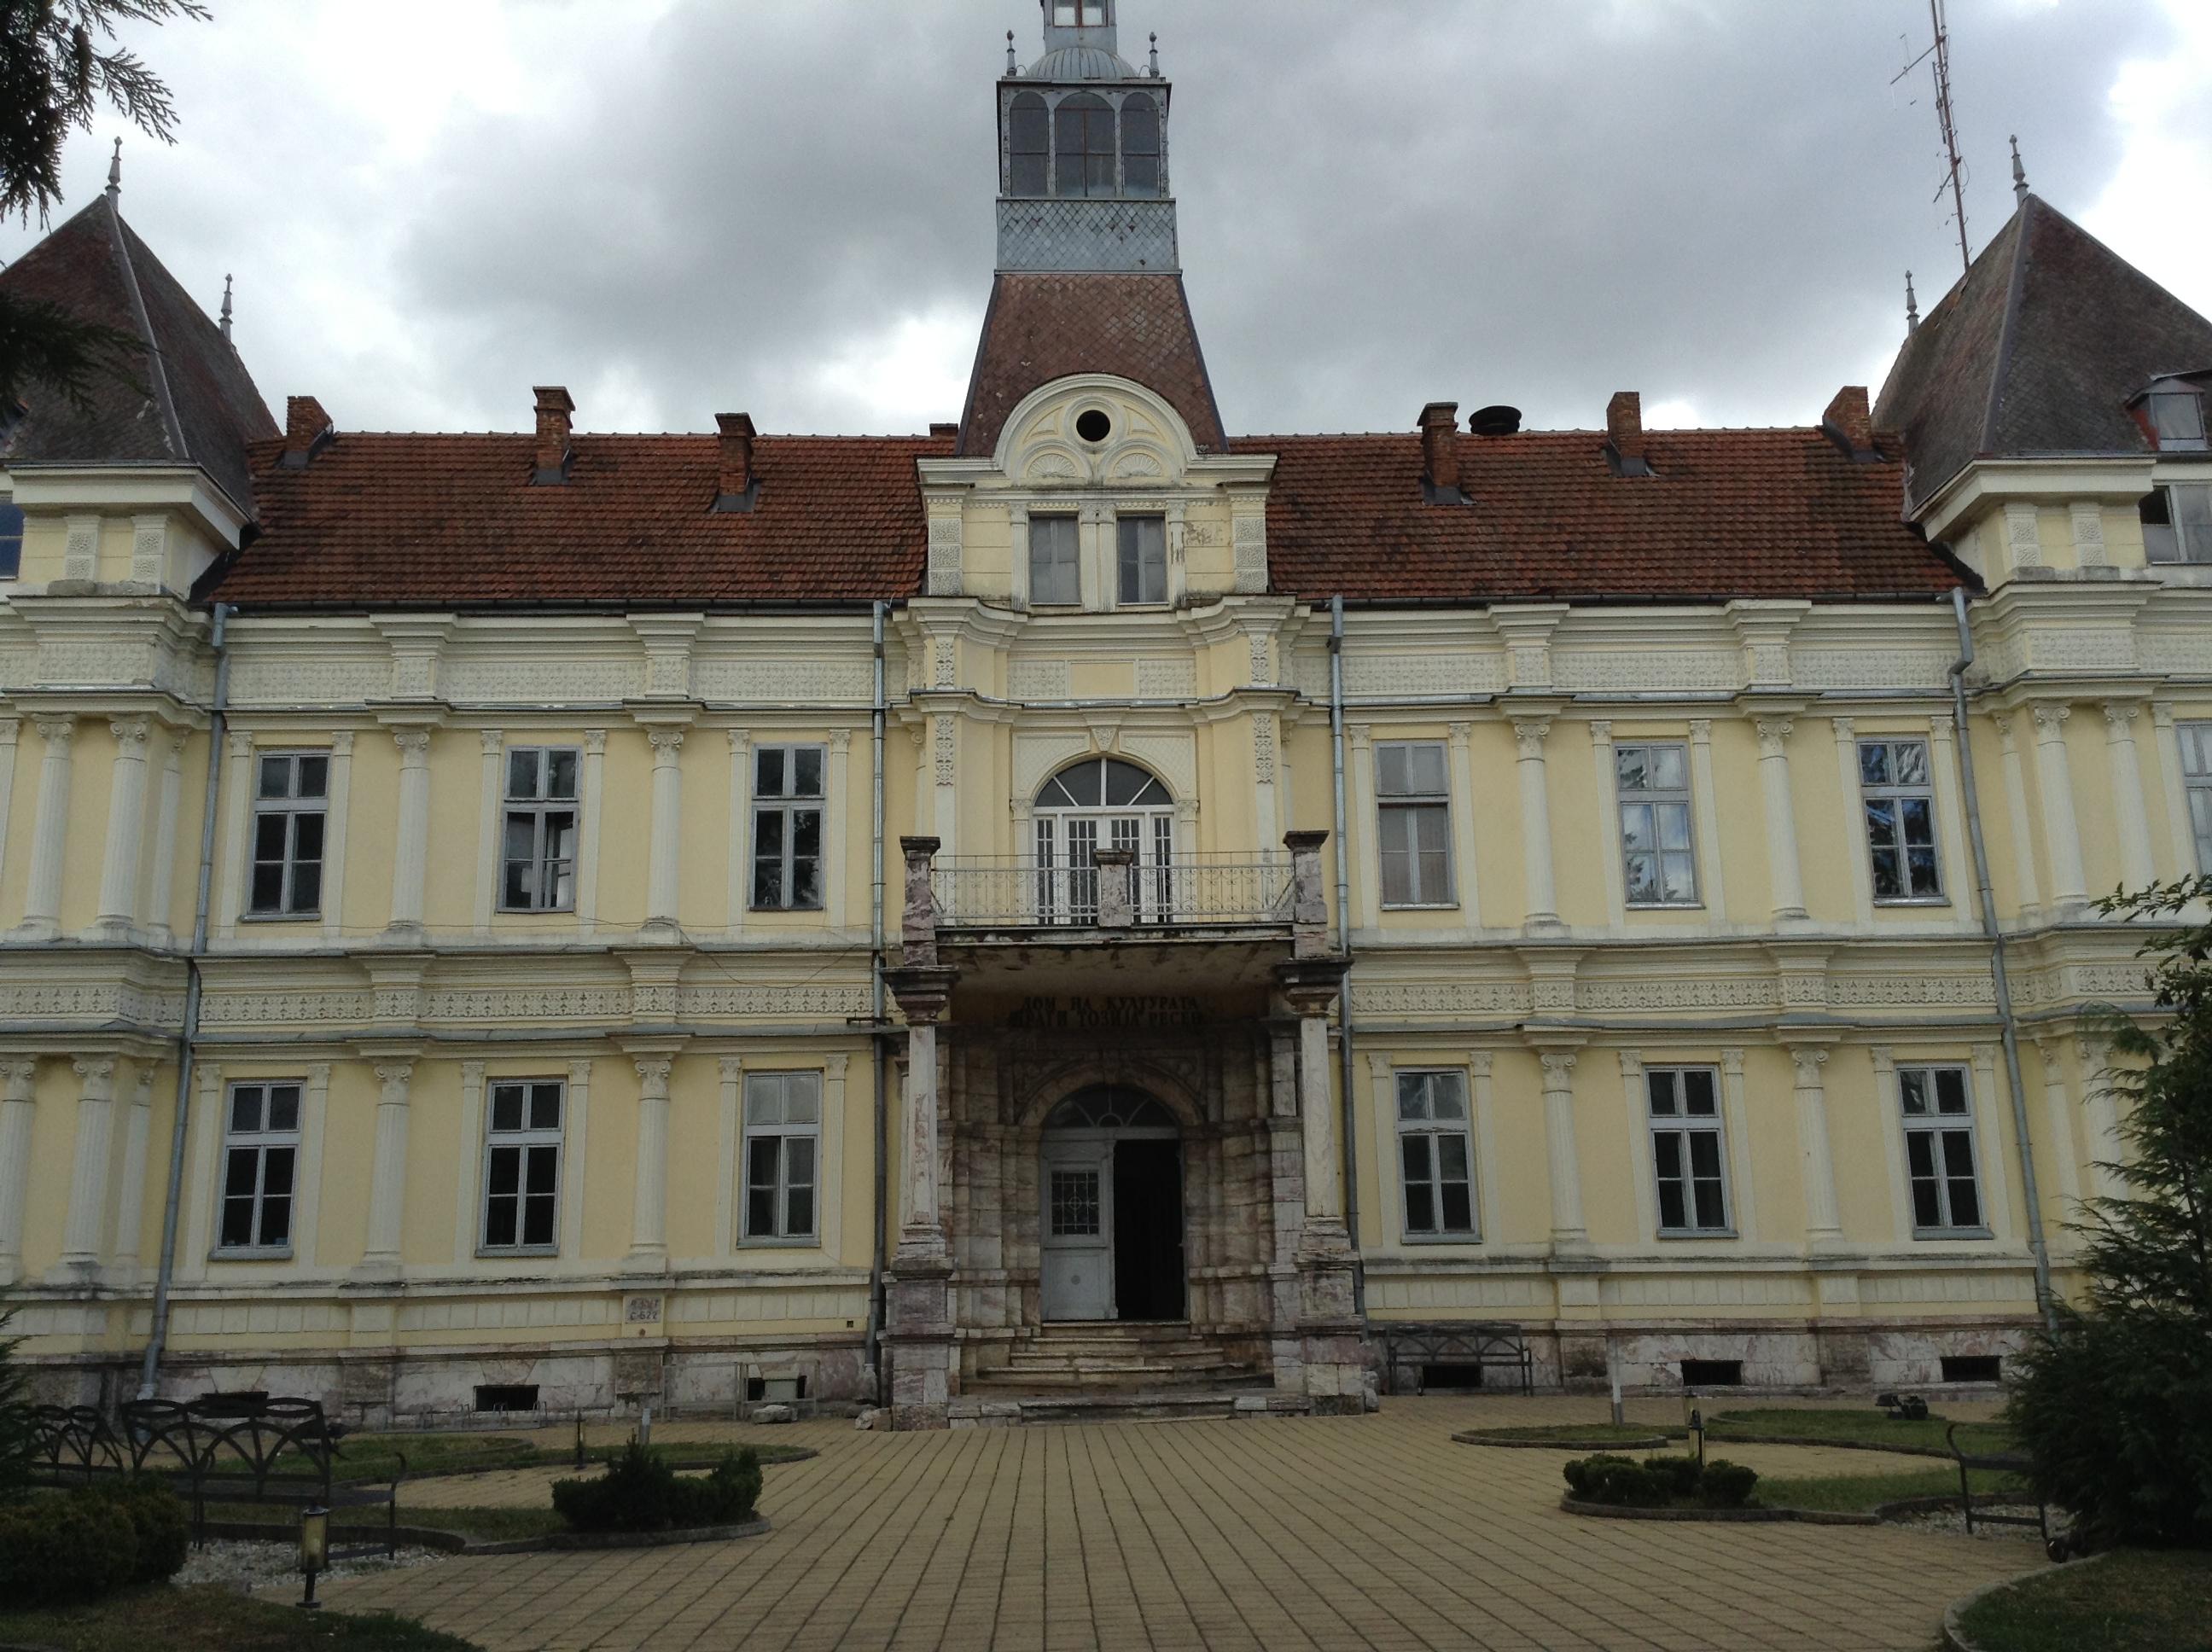 Niyazi Bey'in Sarayı-Resne